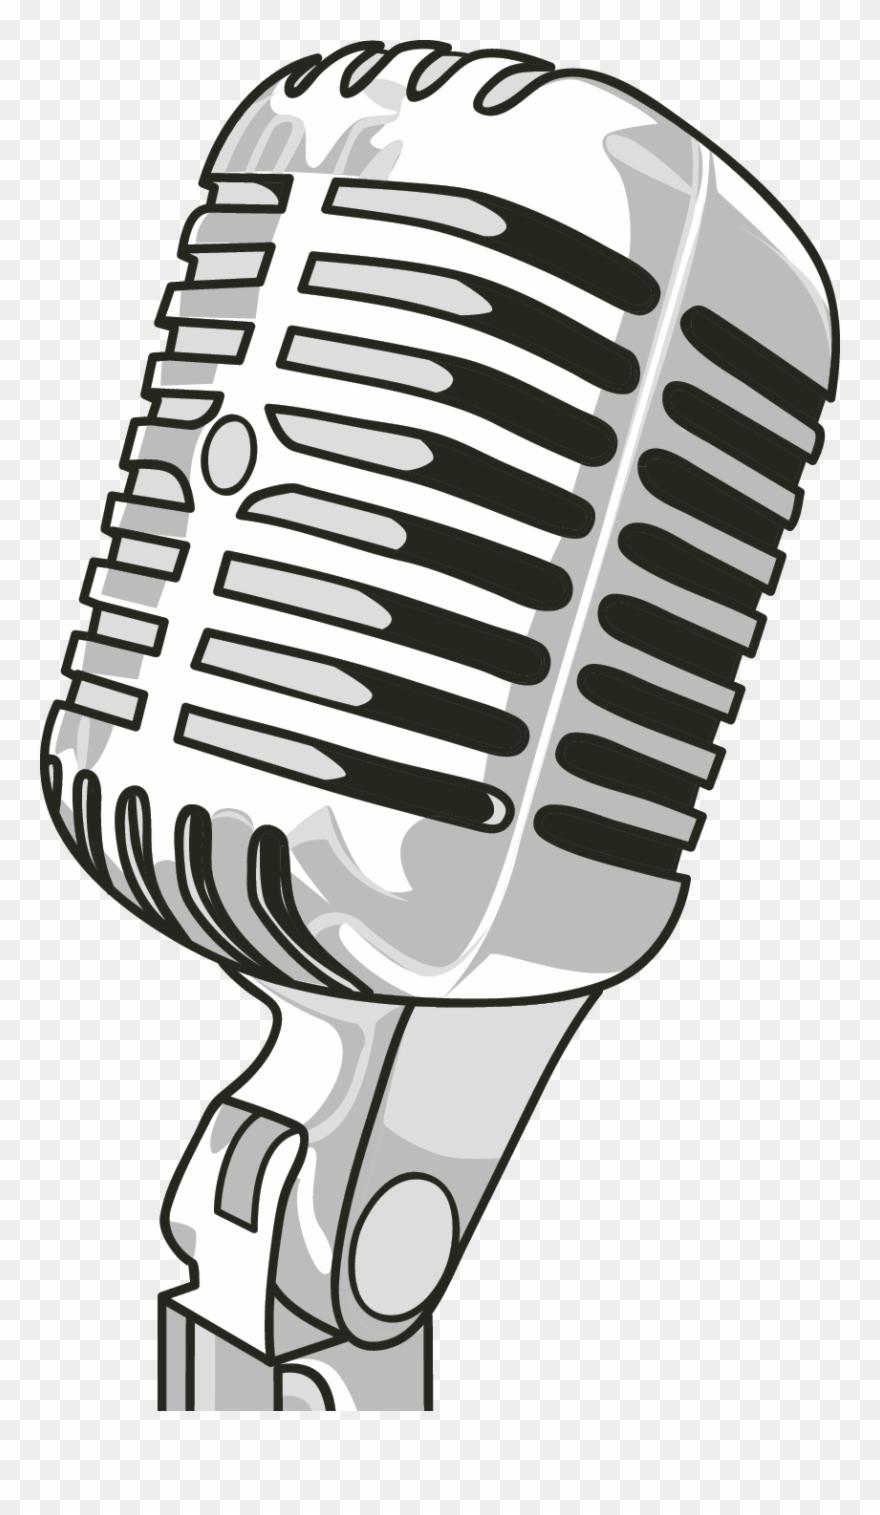 Radio Microphone Clip Art.